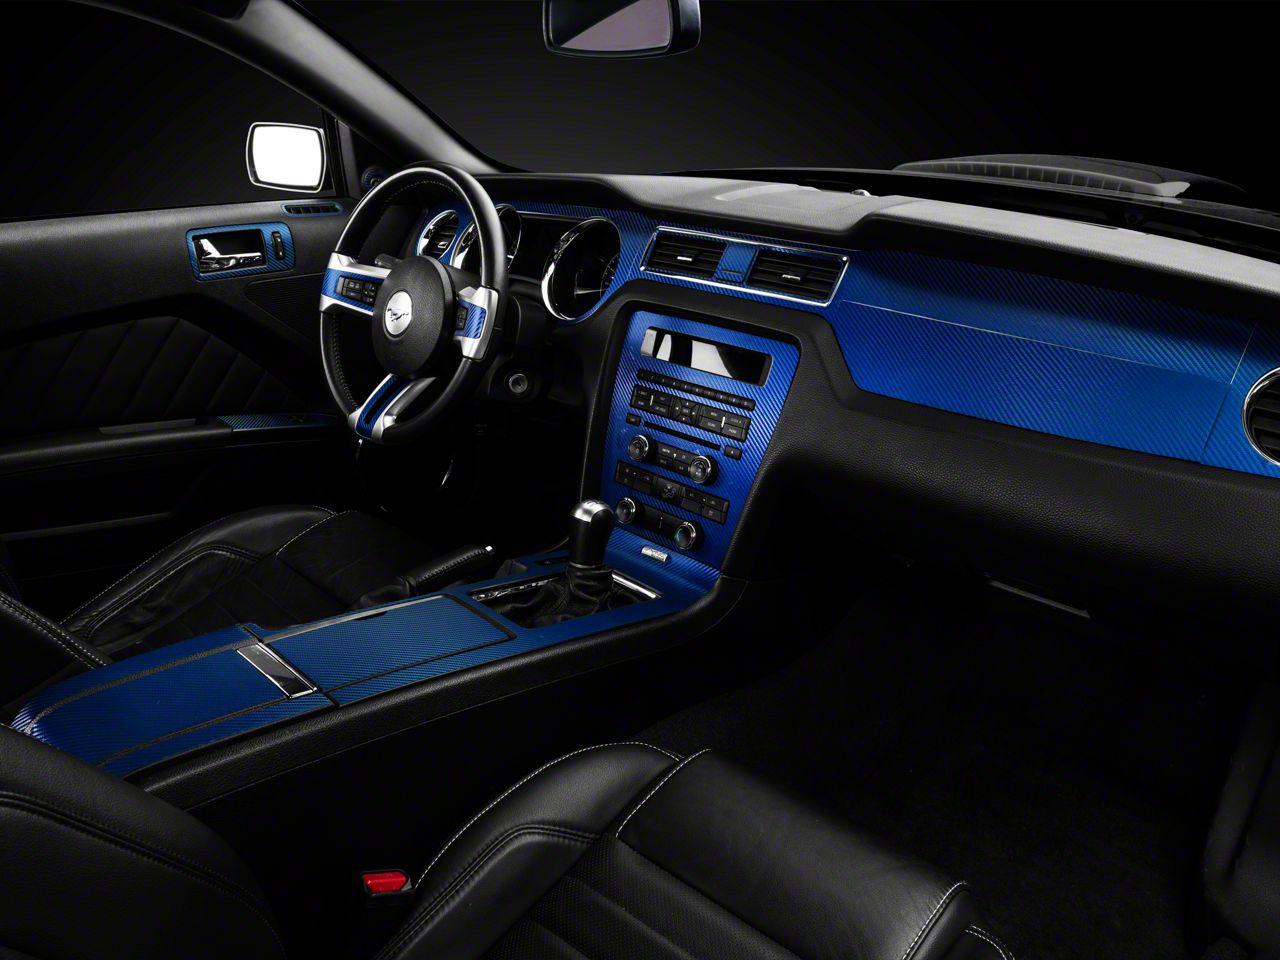 Sec10 Mustang Dash Overlay Kit Blue Carbon Fiber 390788 10 14 All